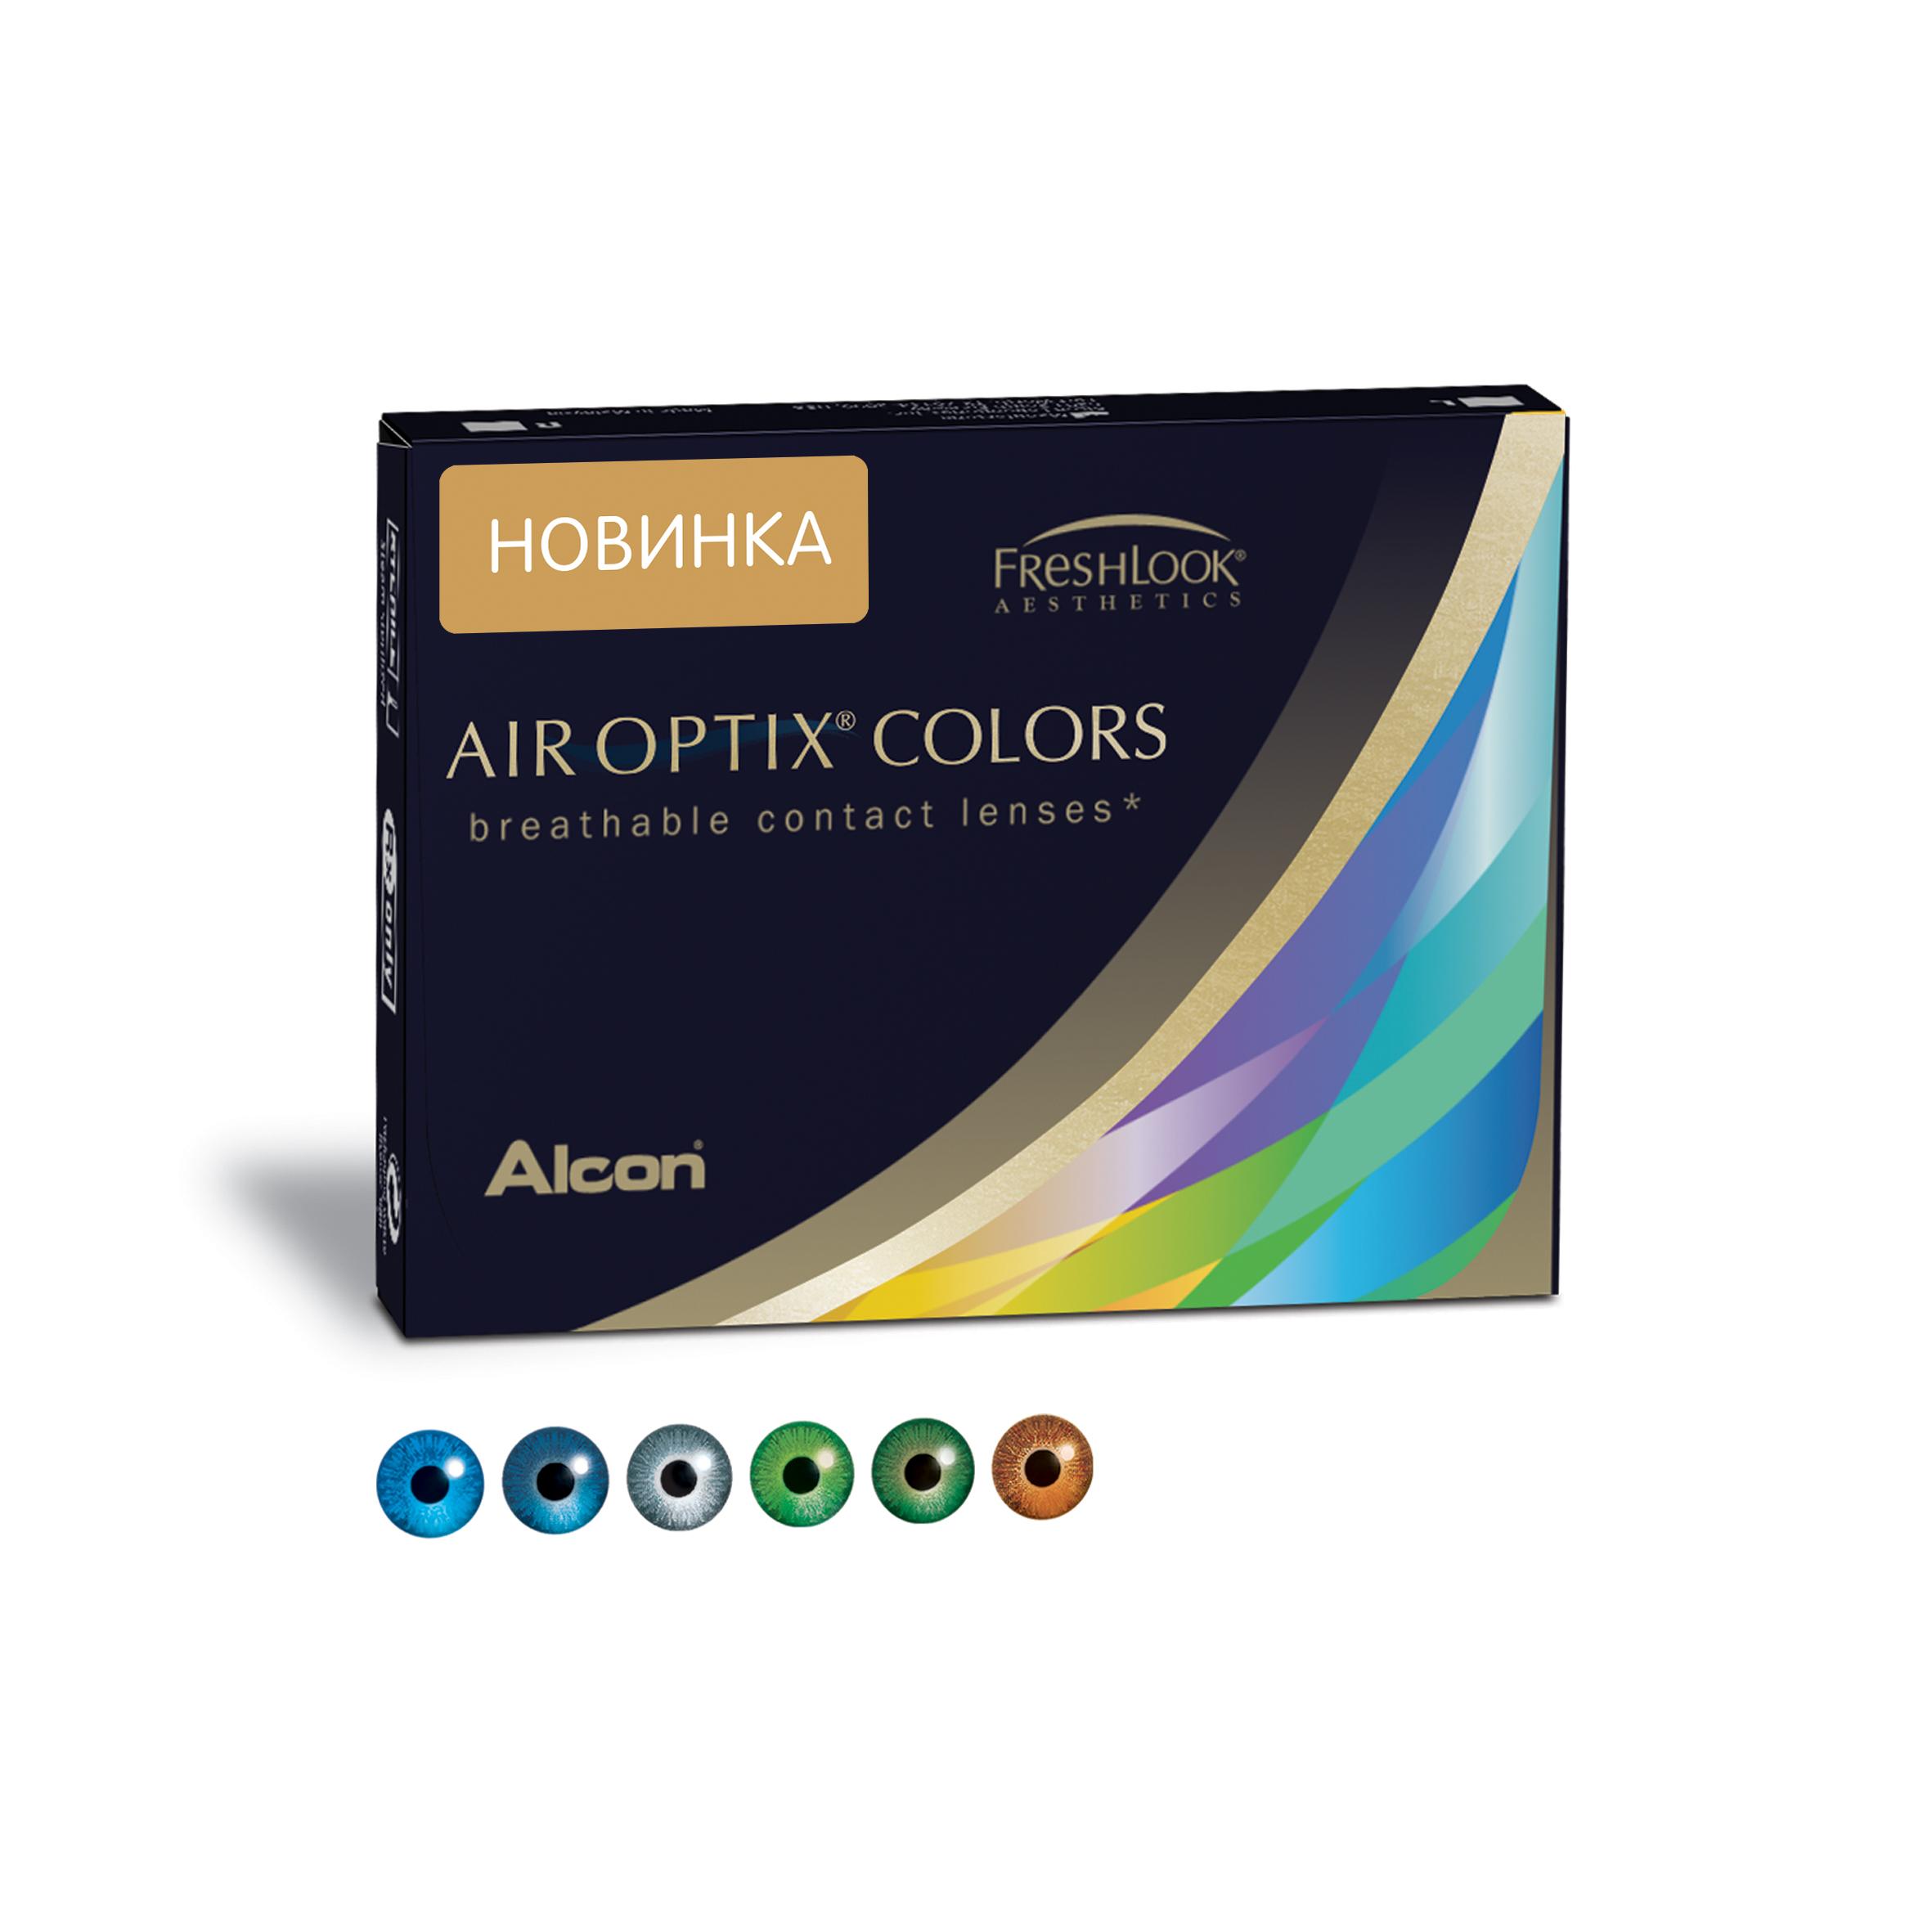 Аlcon контактные линзы Air Optix Colors 2 шт -3.75 Brilliant Blue31746221Мягкие контактные линзы